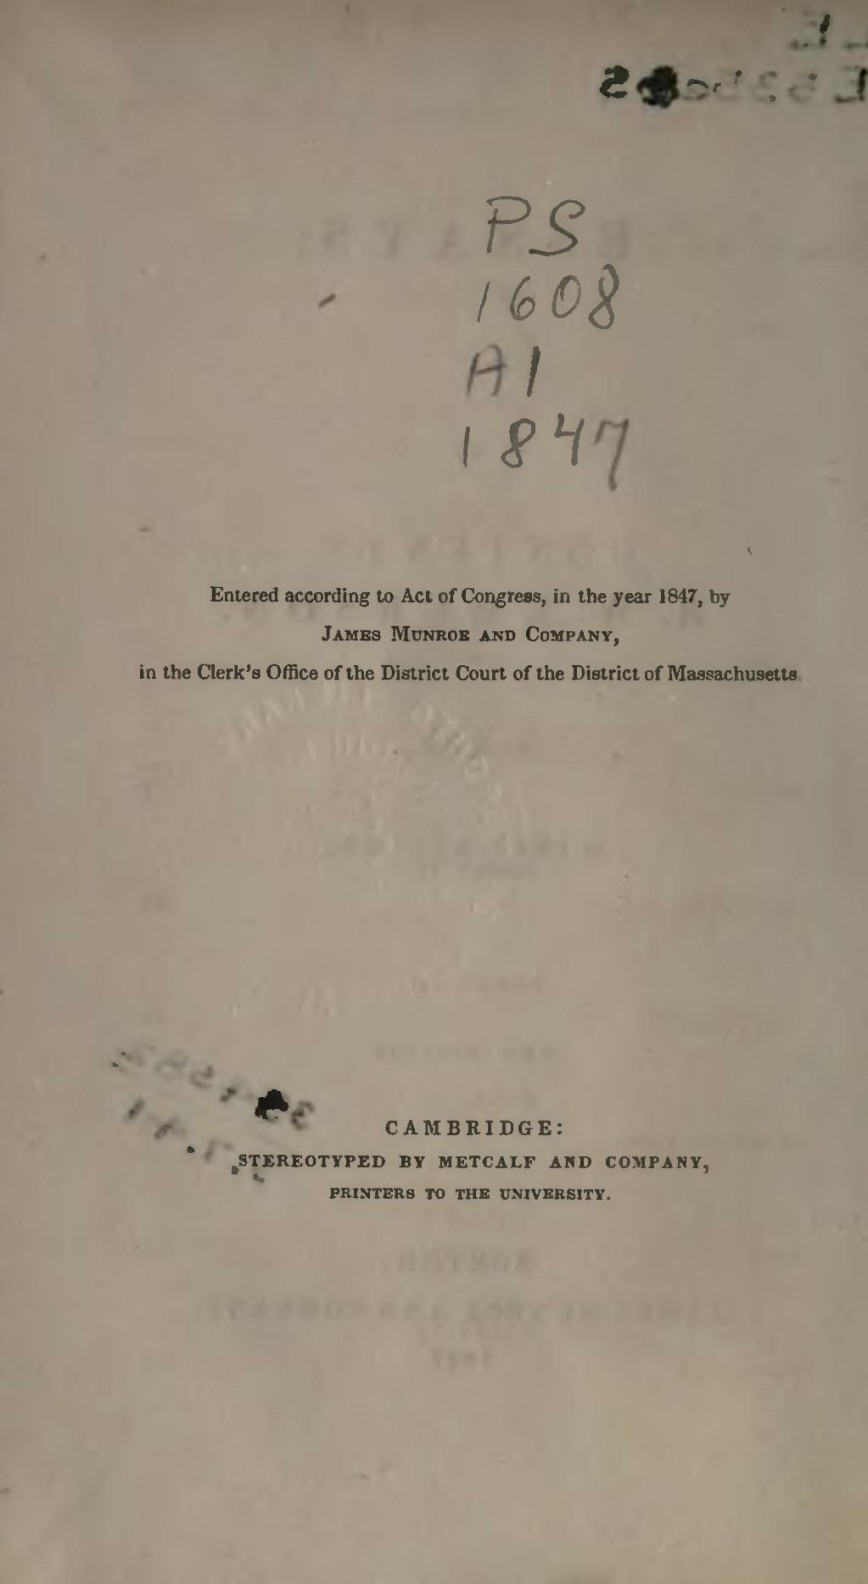 014 Essays First Series Page10 1024px Essays2c 28184729 Djvu Essay Stunning Emerson Pdf Ralph Waldo 1841 Publisher